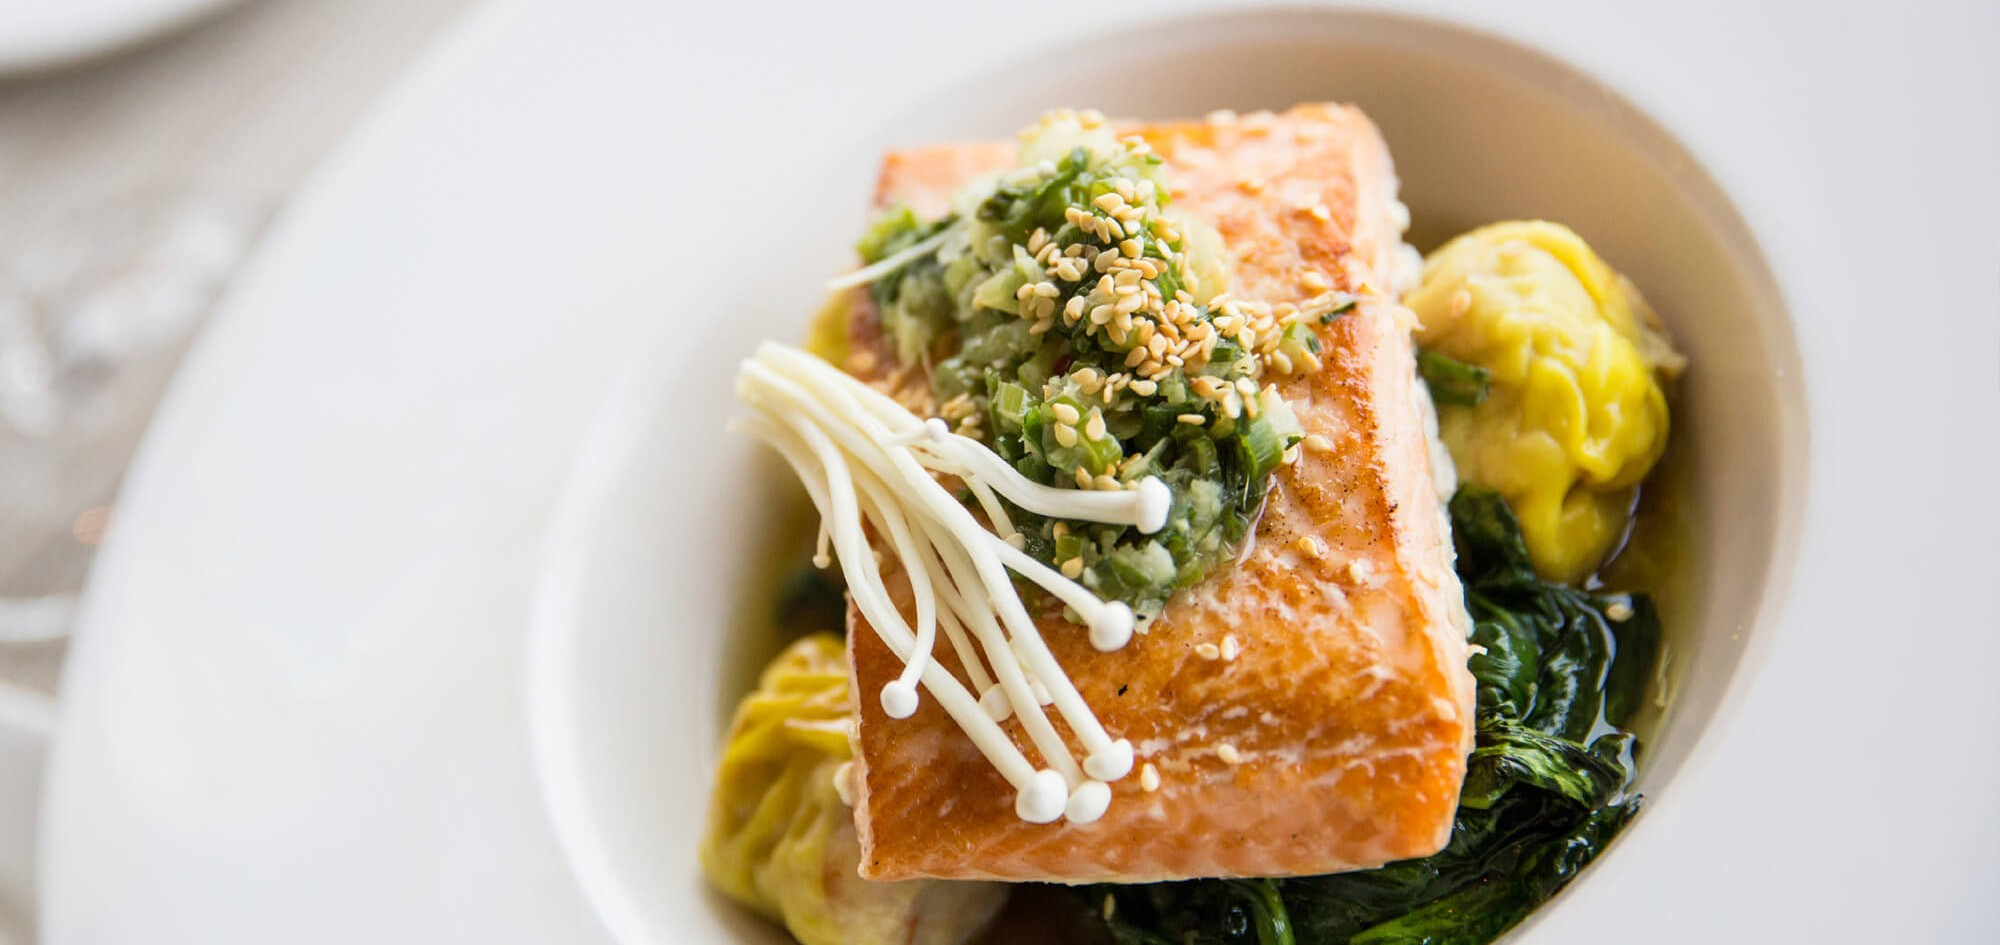 Hibachi Salmon with Teriyaki Glaze.